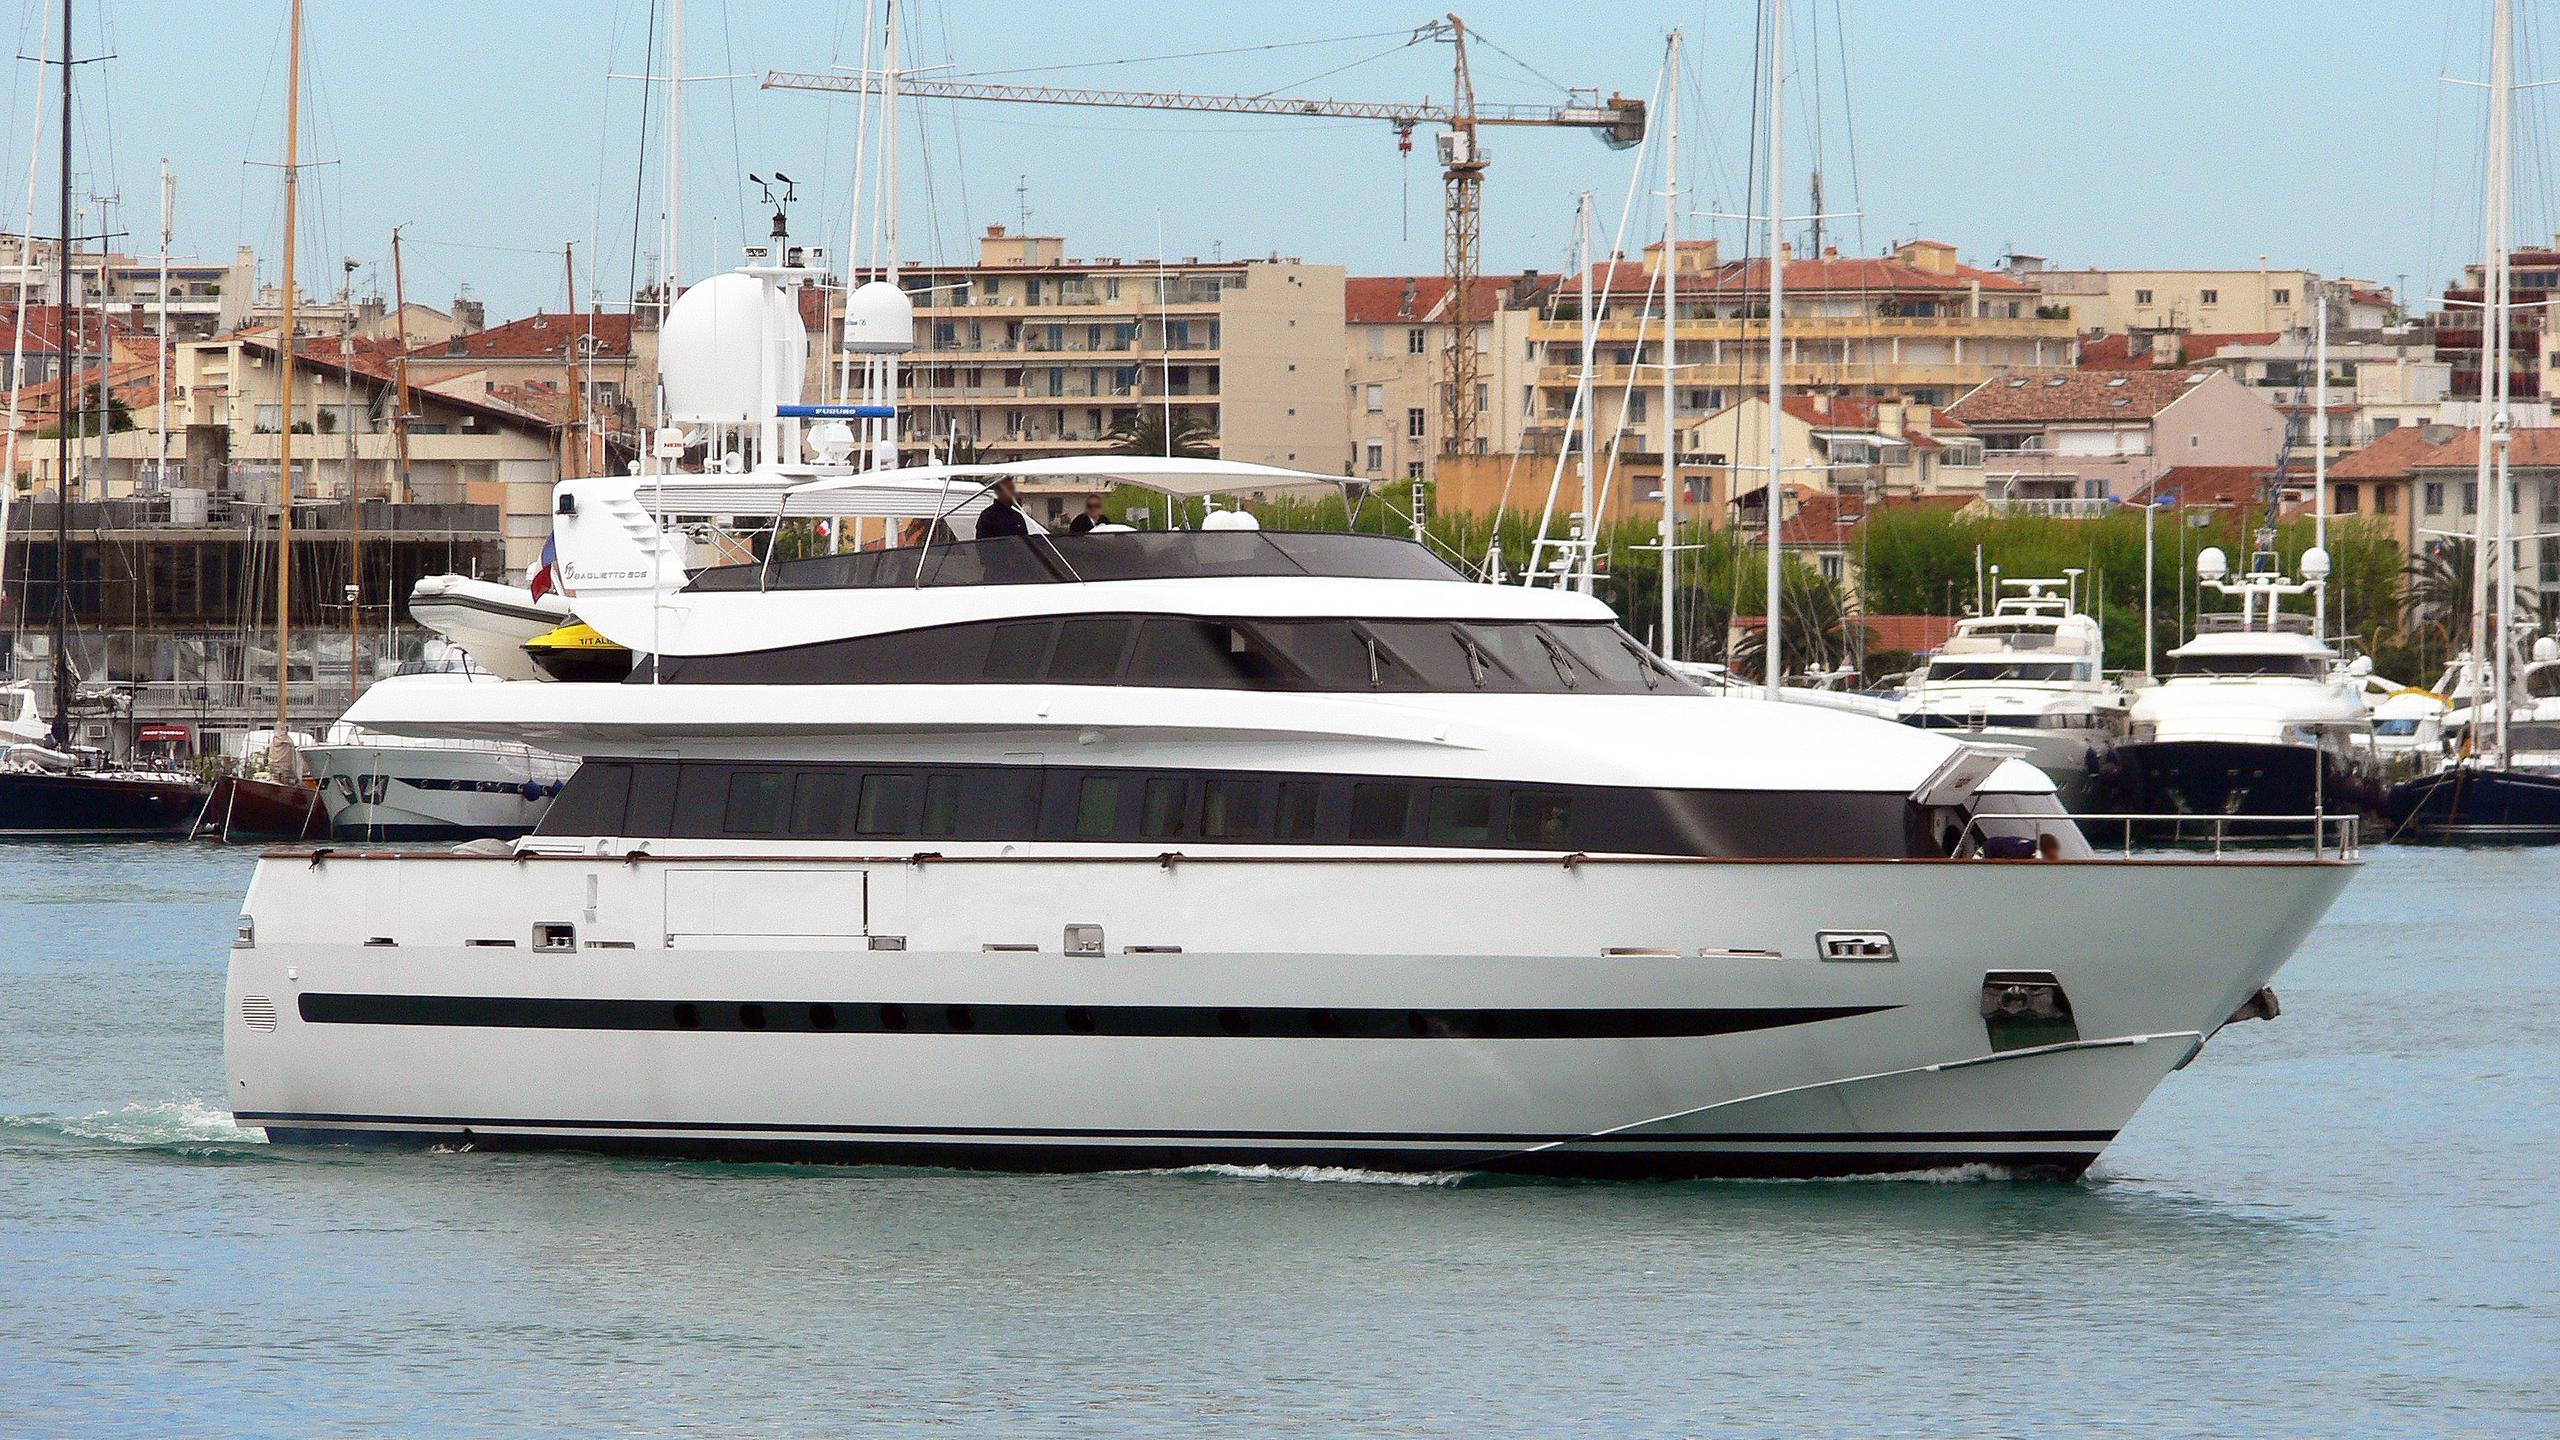 kenayl-ii-motor-yacht-baglietto-30s-1993-30m-cruising-half-profile